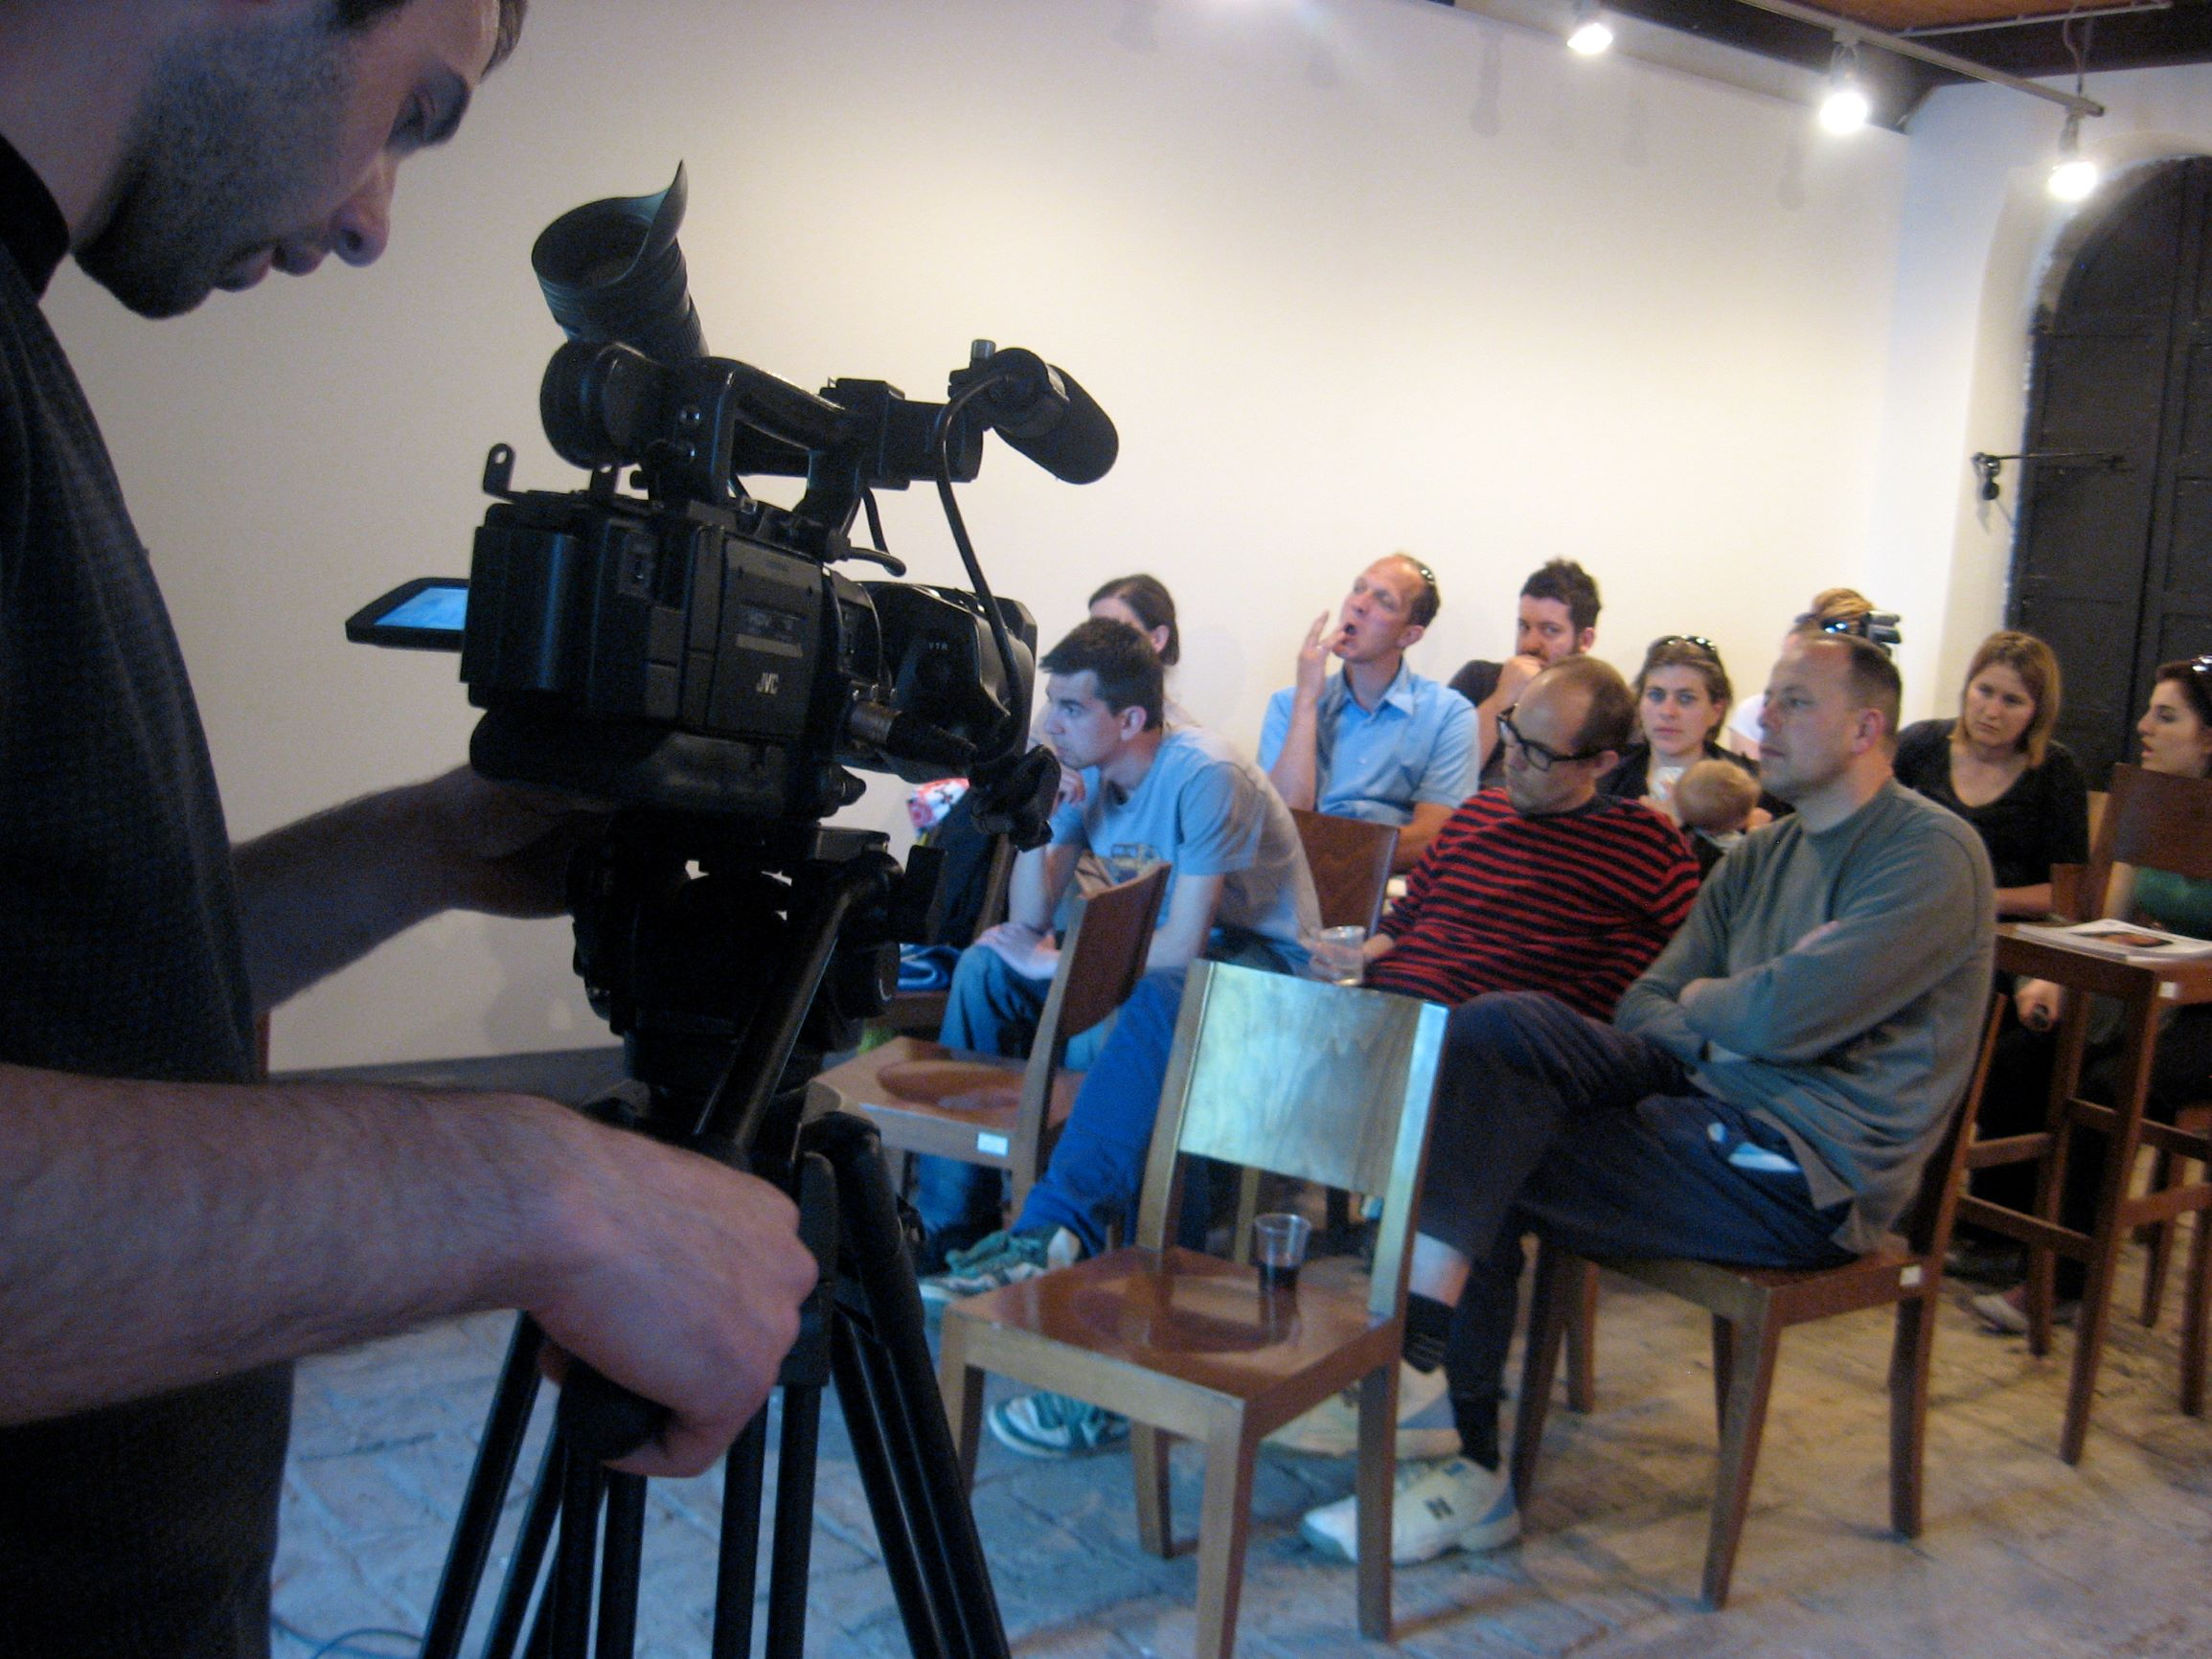 Bisedë mes kuratorës dhe artistit + Koncerti i mbylljes nga Hidde van Schie